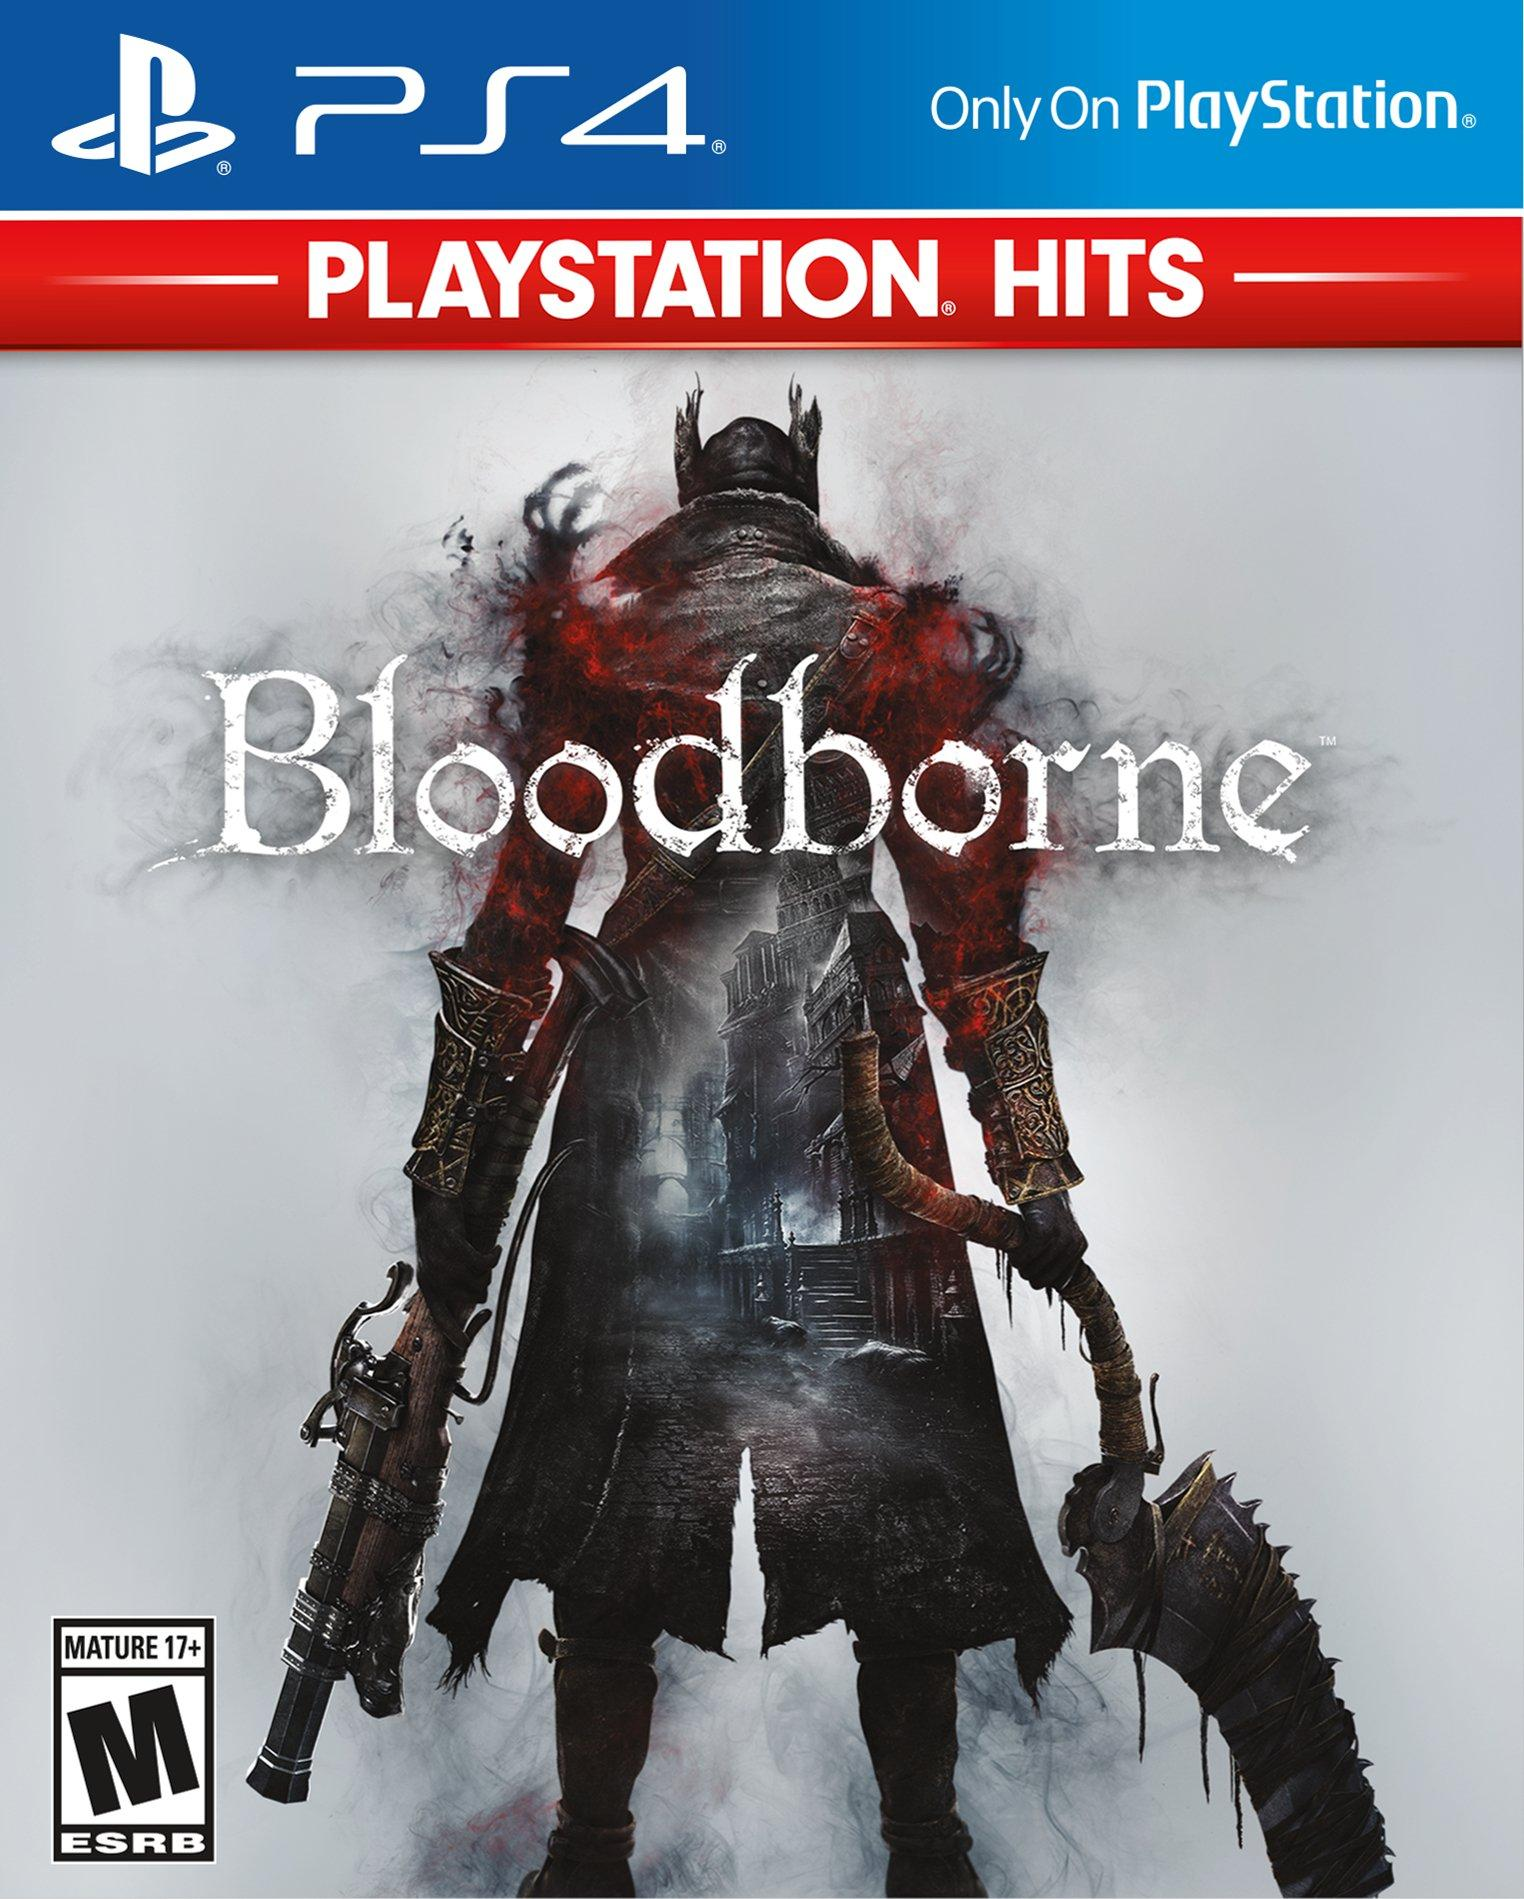 Bloodborne Playstation 4 Gamestop